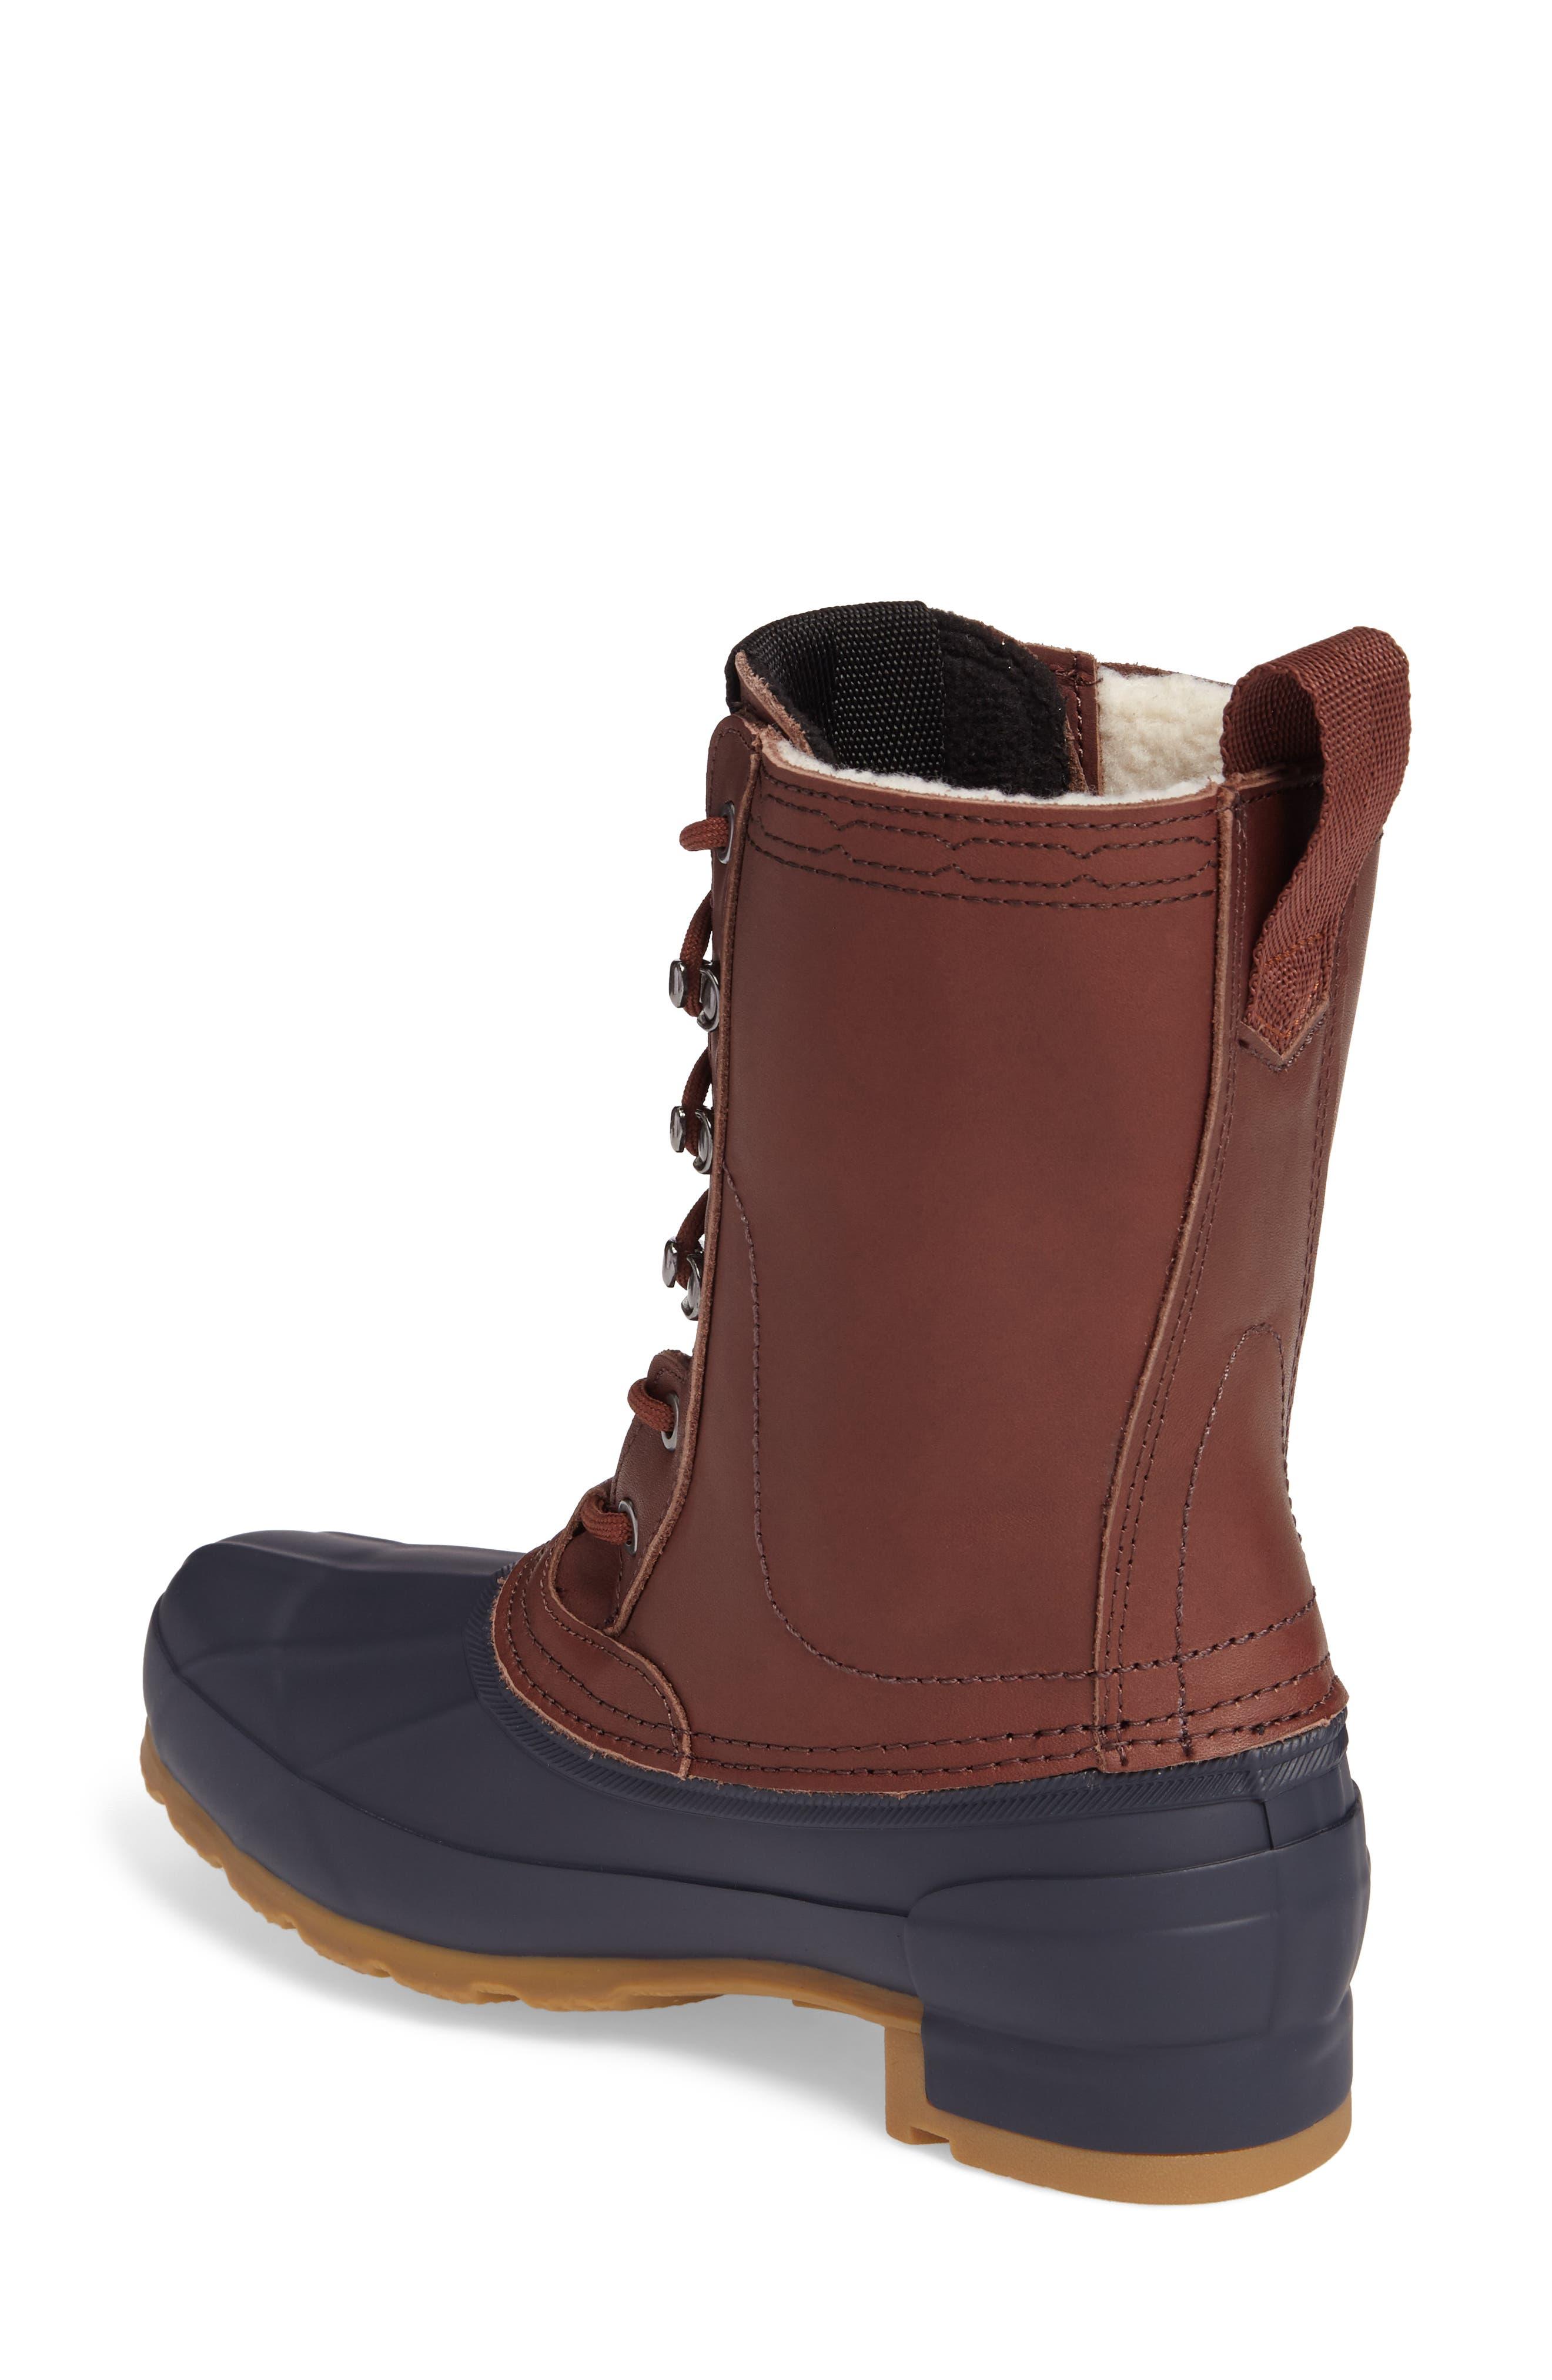 Alternate Image 2  - Hunter Original Insulated Boot (Women)